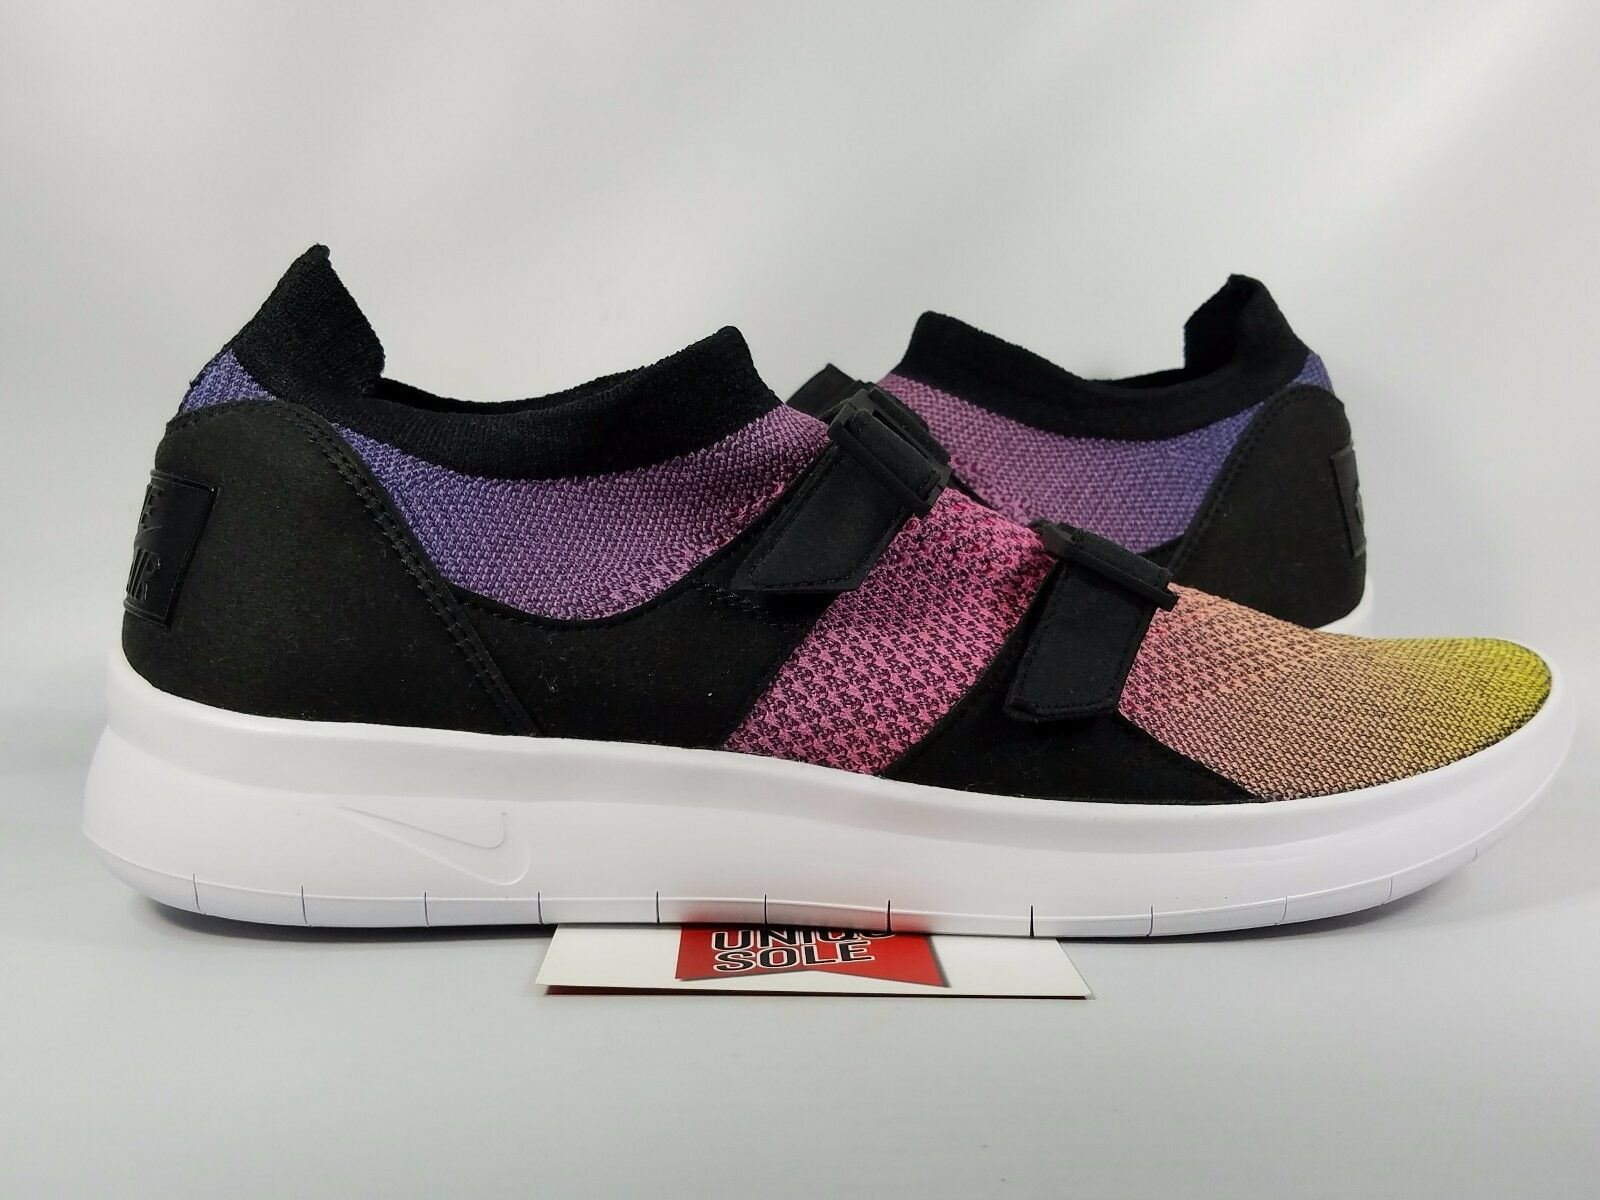 NEW Nike Air Sockracer Flyknit MULTICOLOR PINK YELLOW STRIKE 898021-700 sz 10